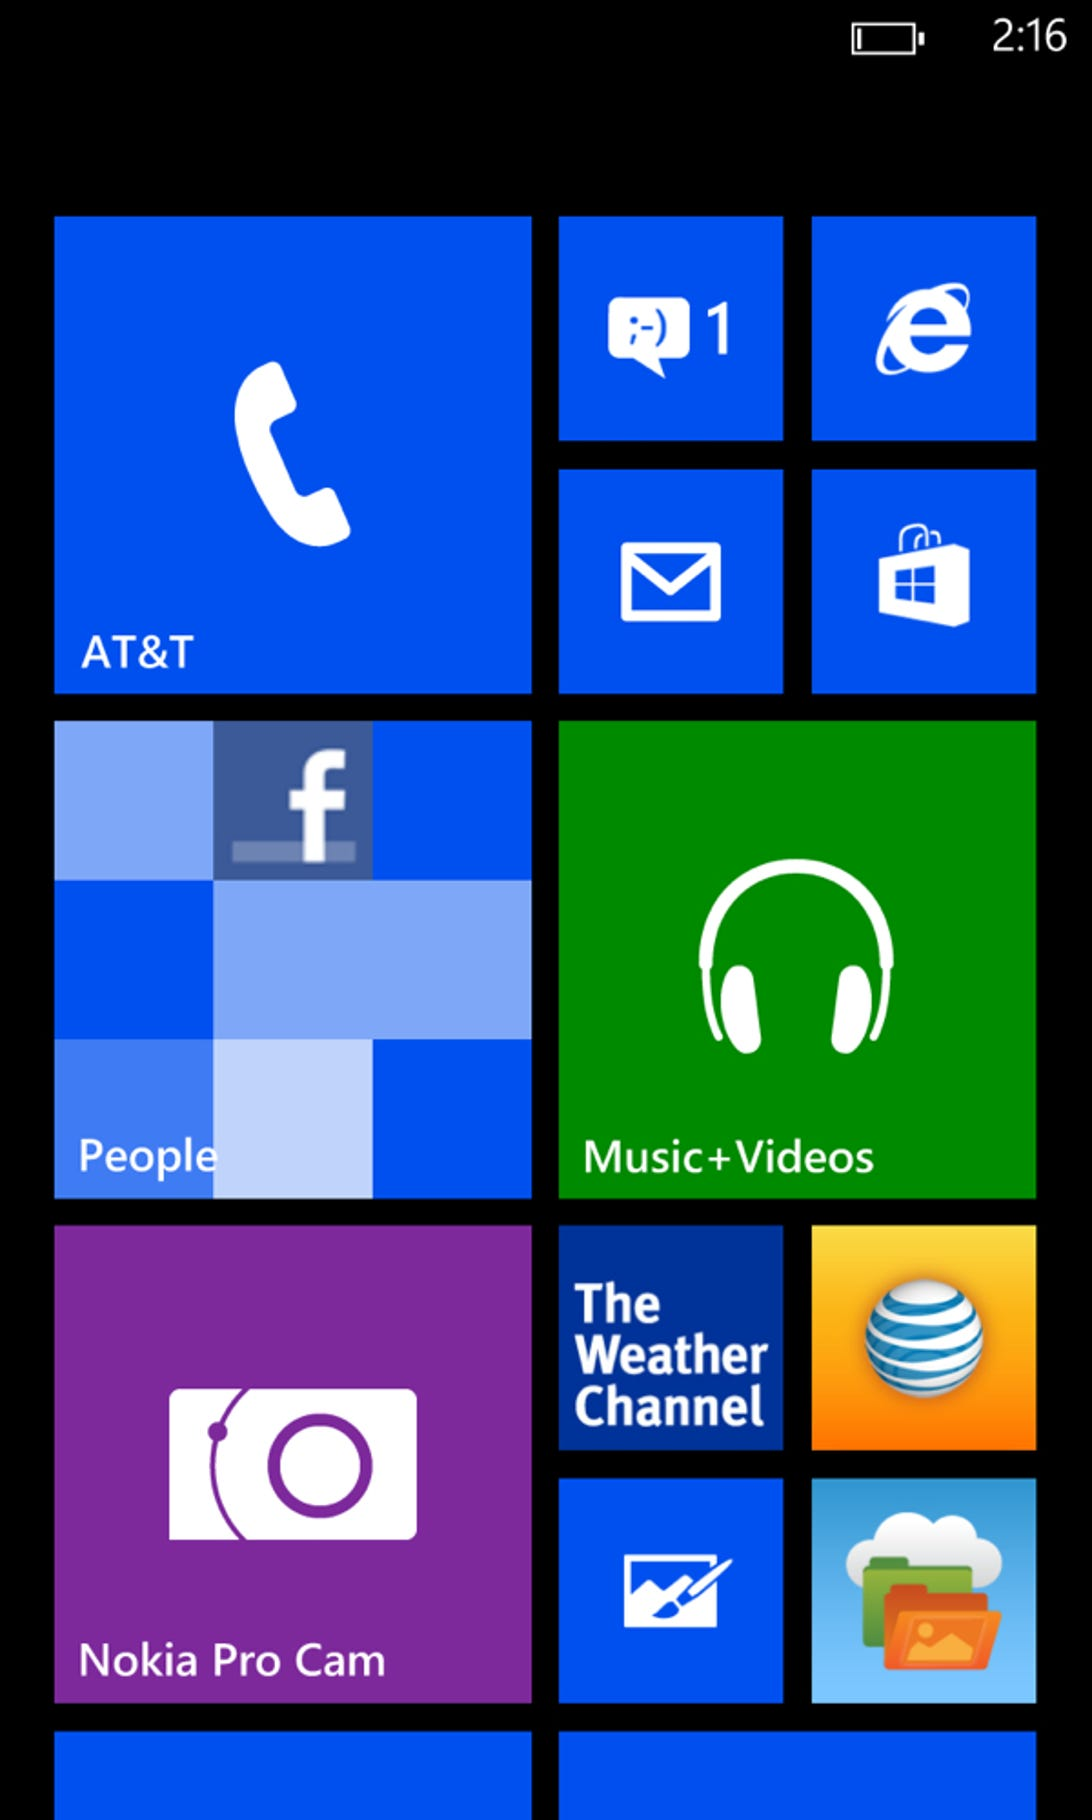 lumia1020hwsw13.jpg